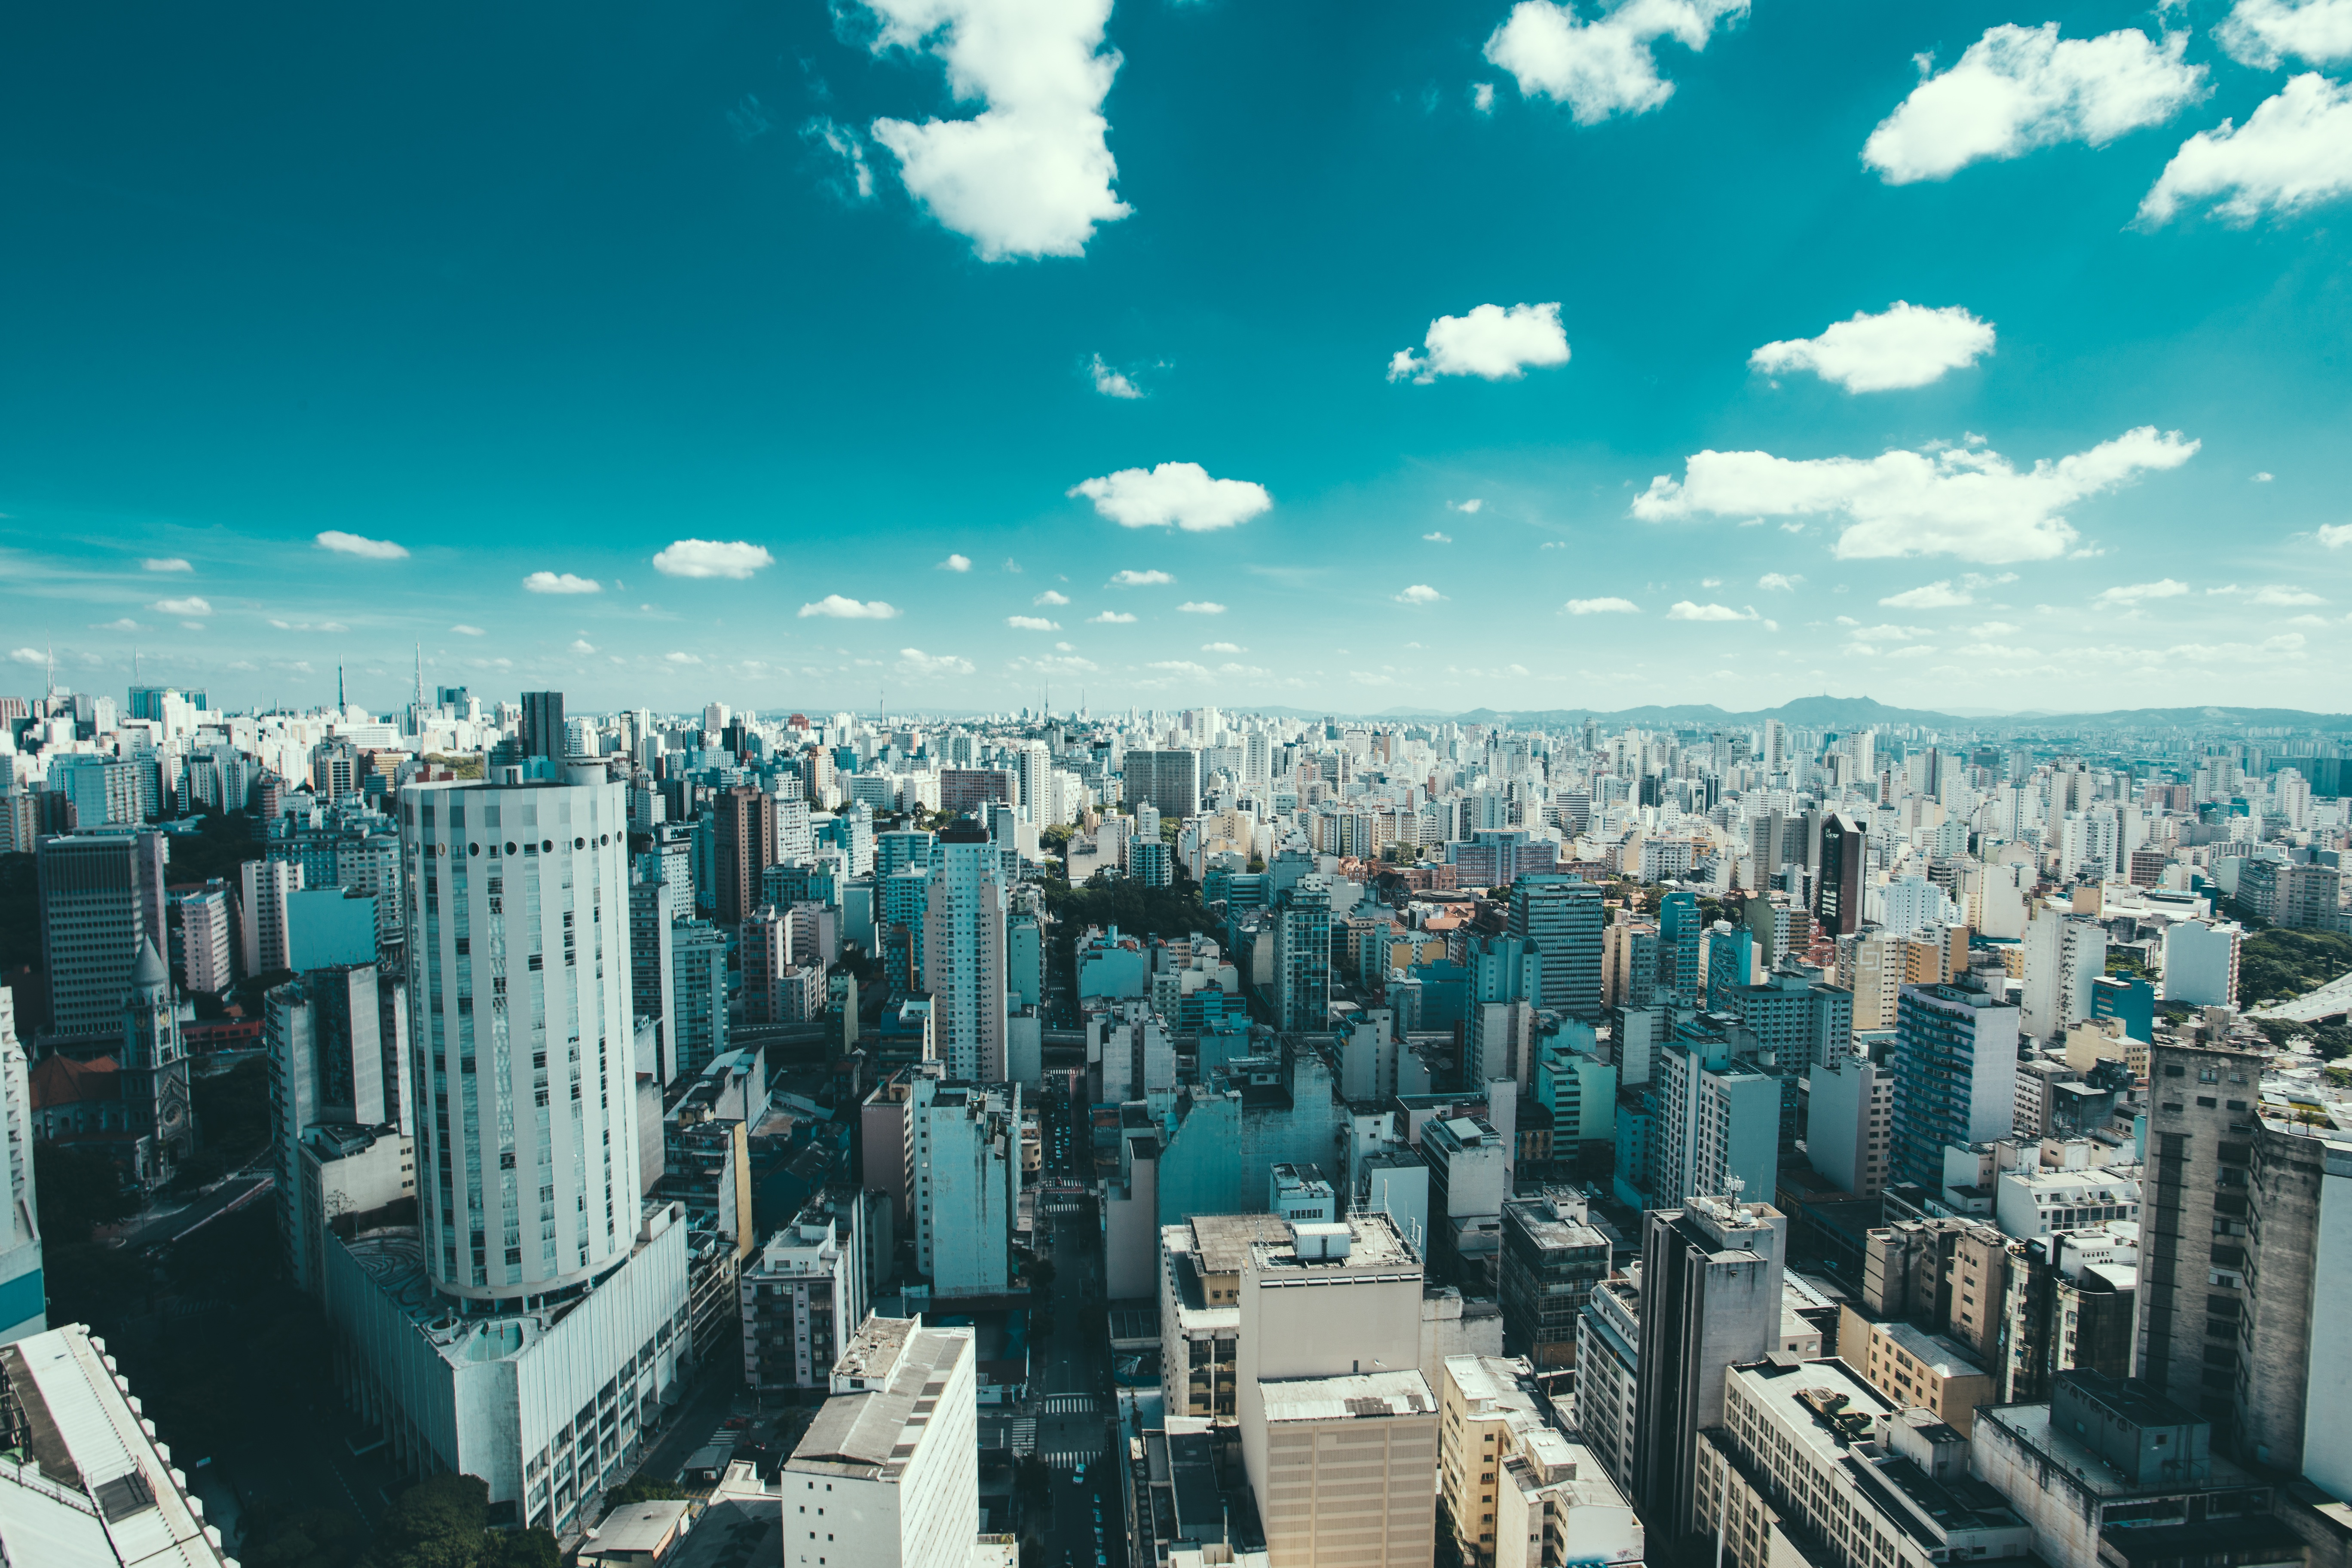 Santa Branca - São Paulo